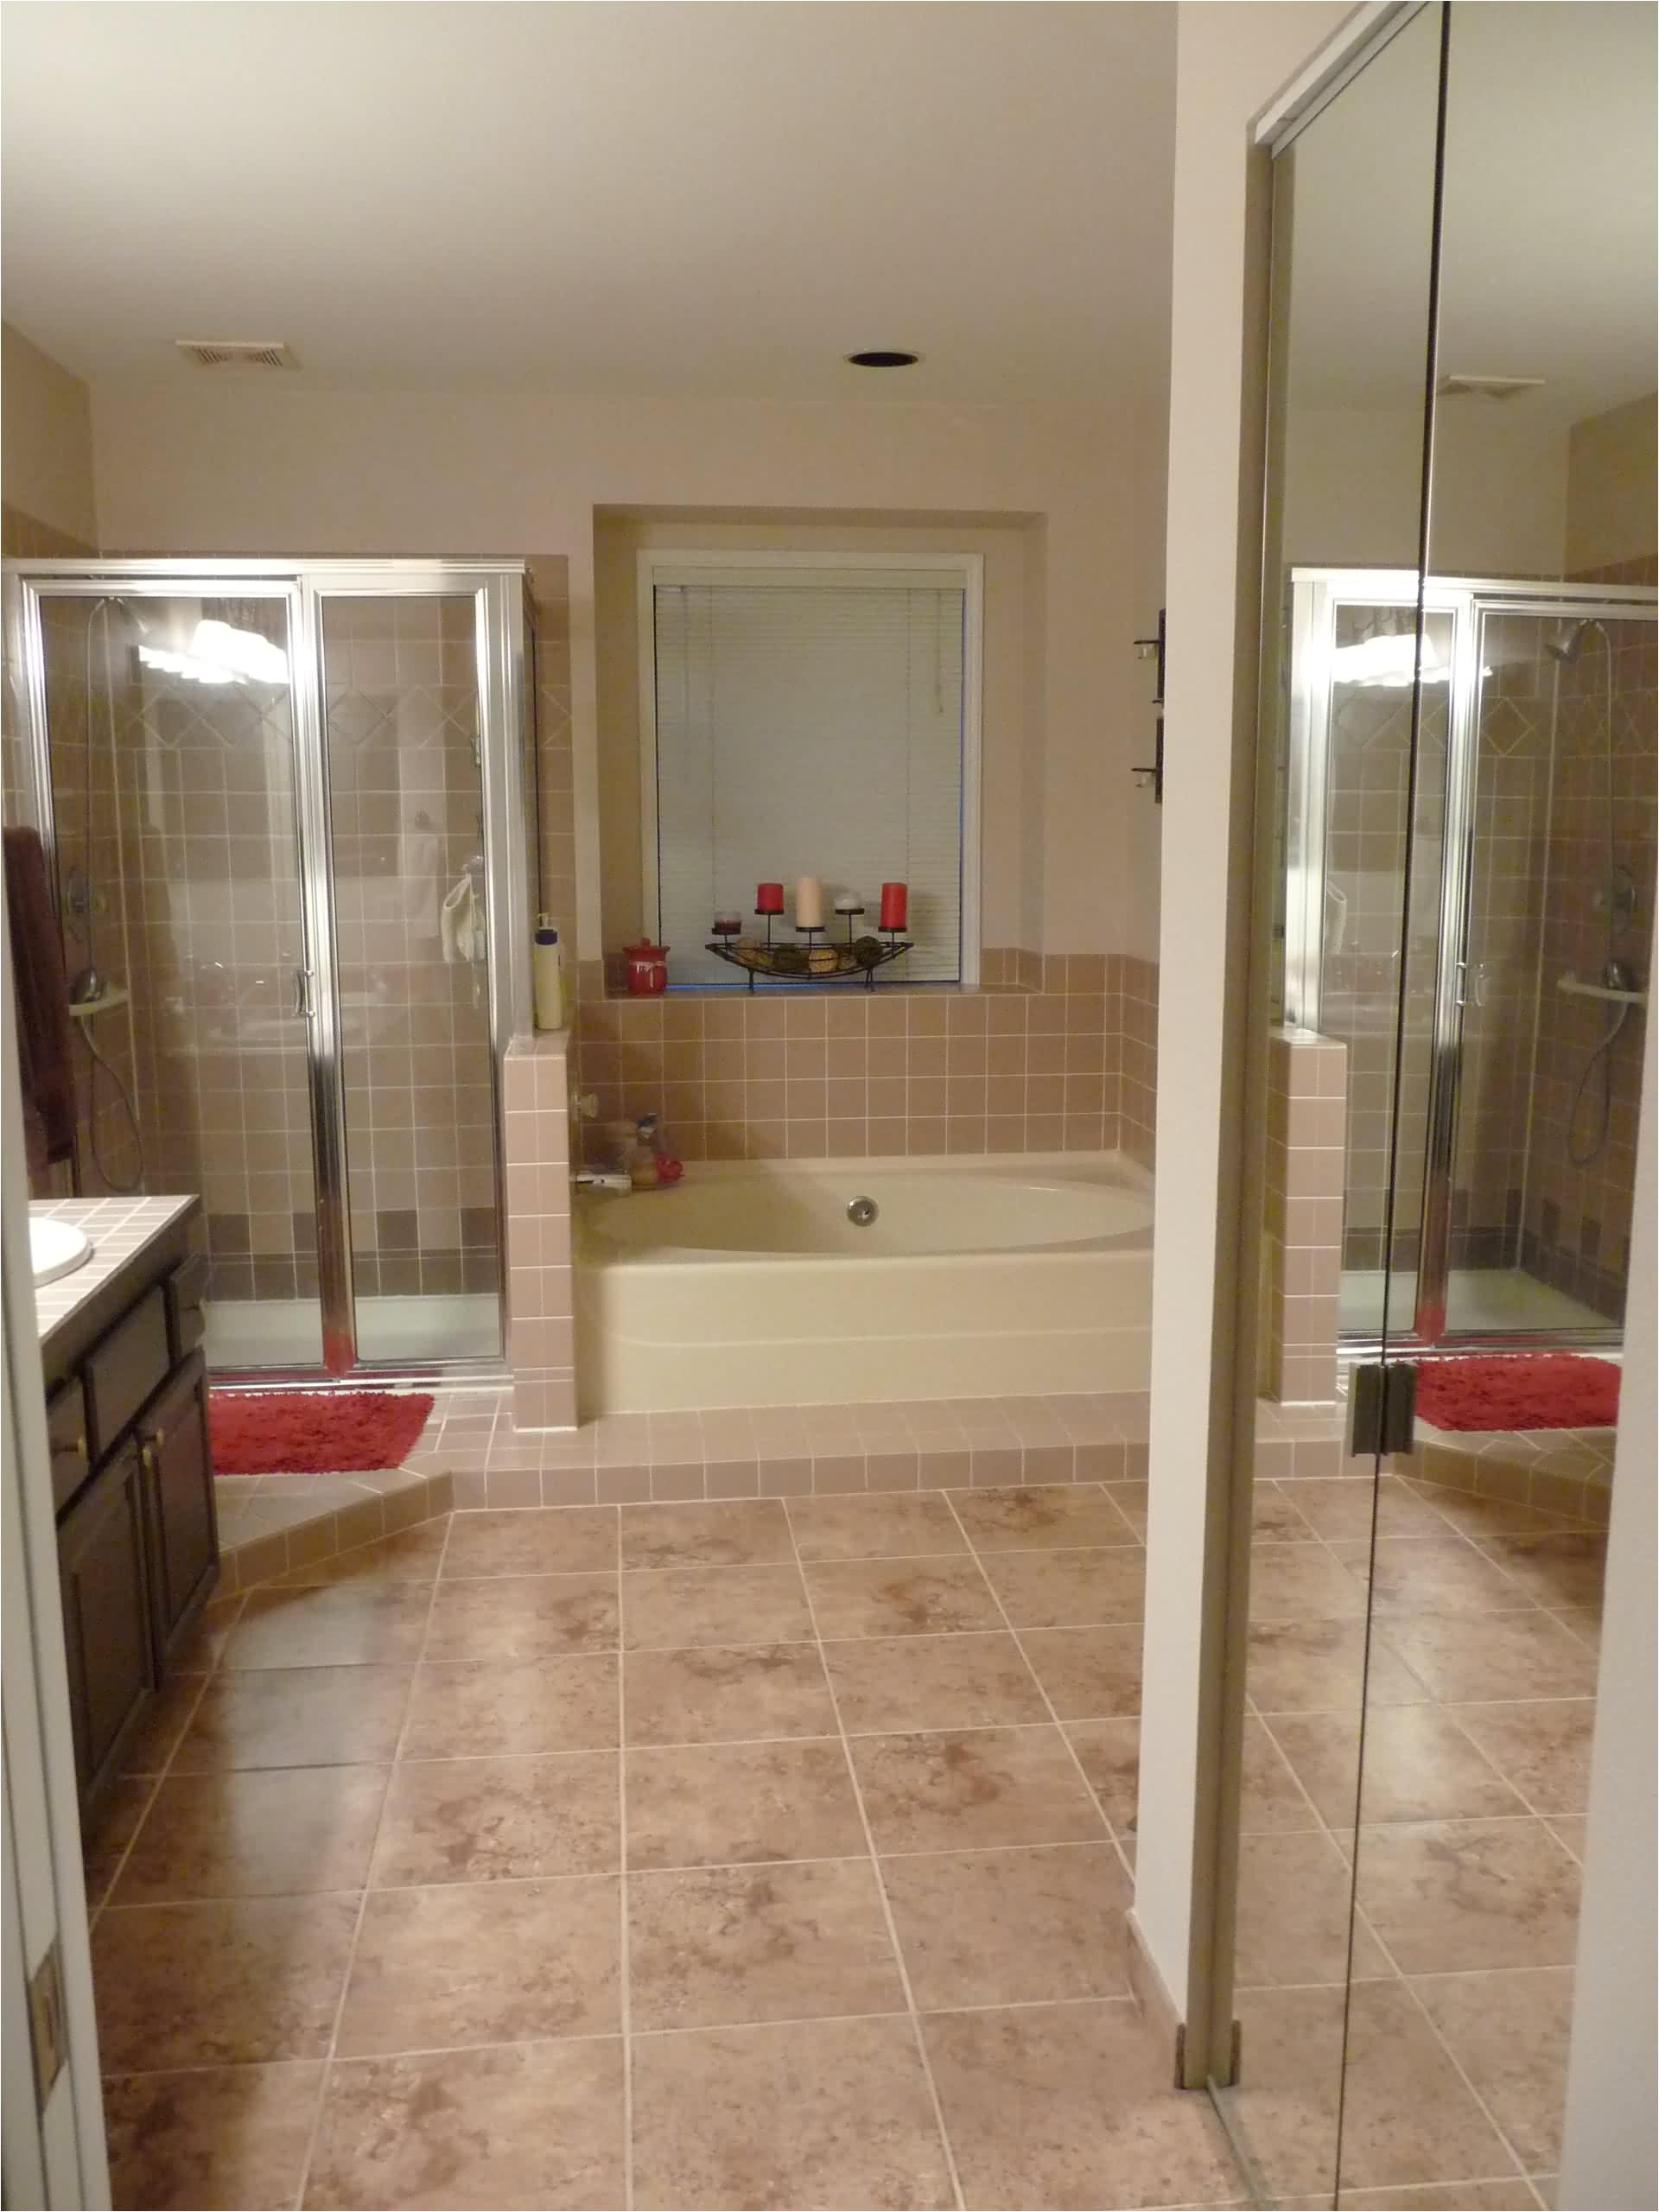 bathroom remodel in lynnwood day by day photos